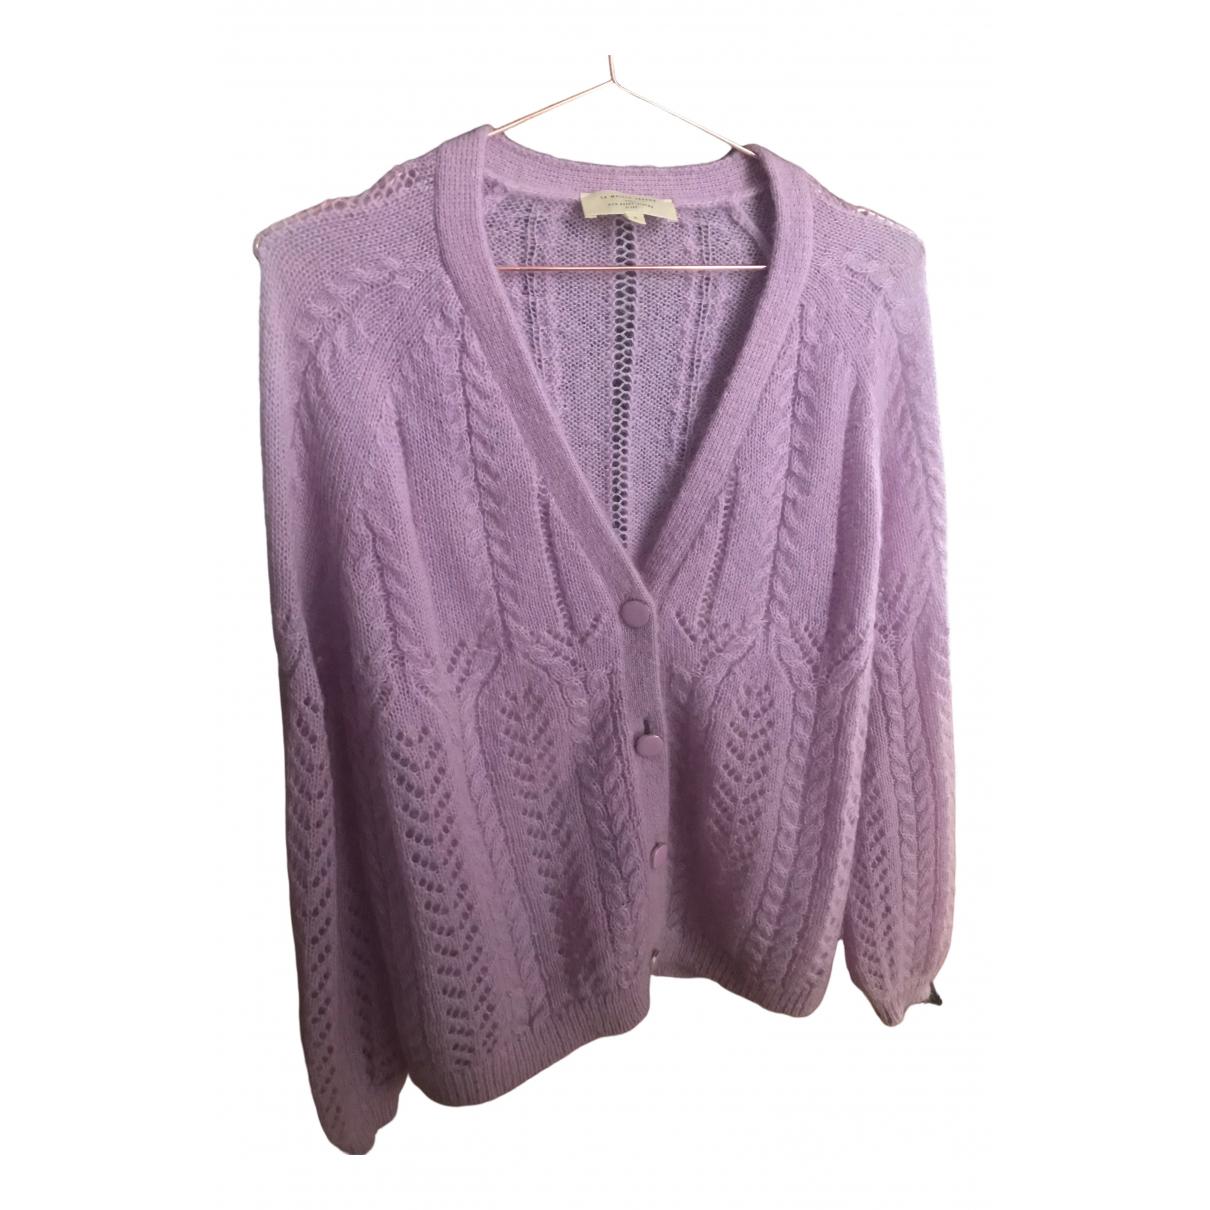 Sezane - Pull Spring Summer 2020 pour femme en laine - violet